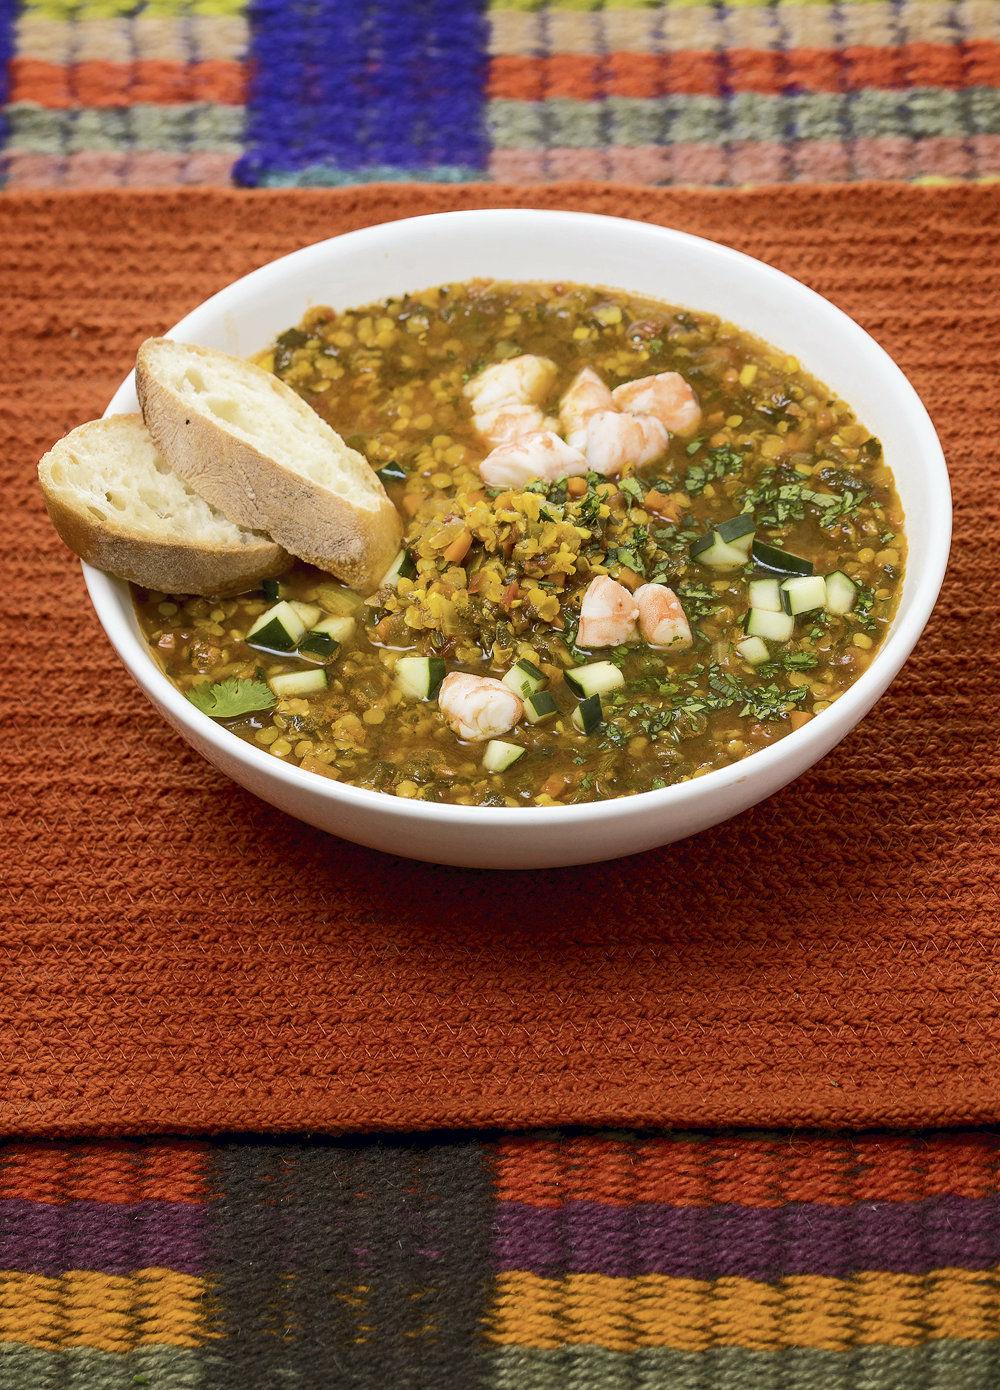 Morrocan_Lentil_soup1